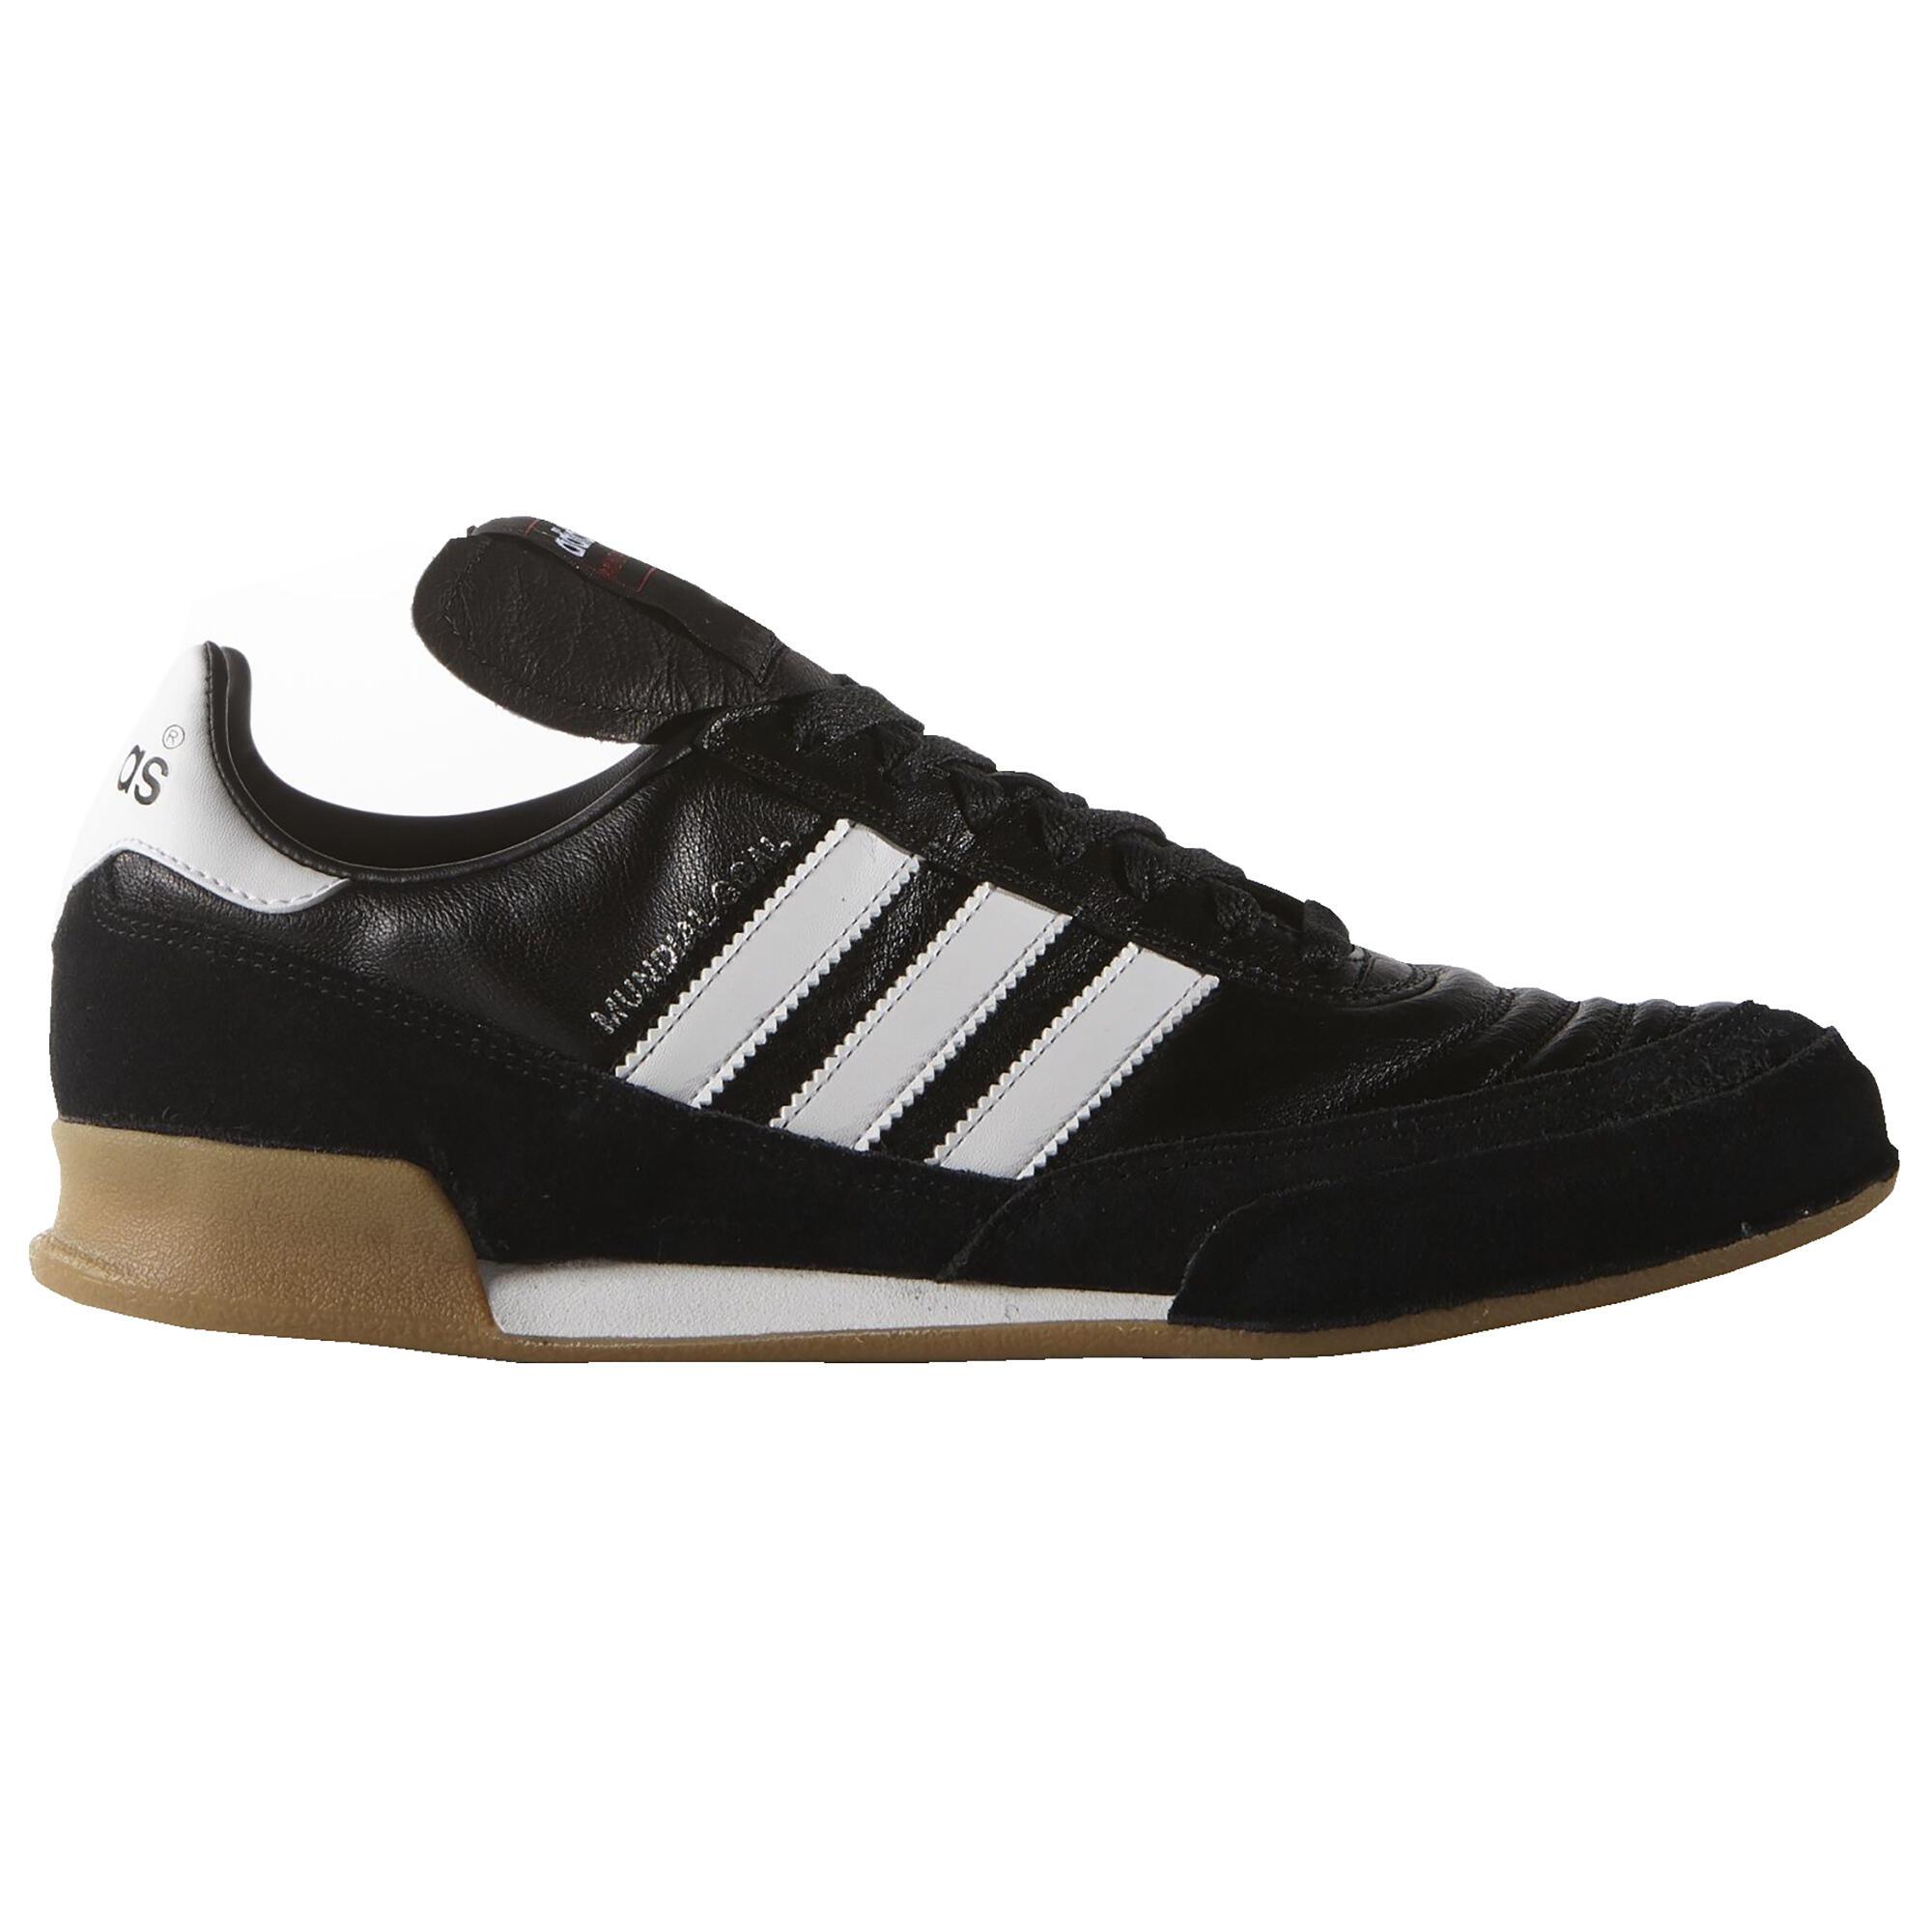 Hallenschuhe Futsal Mundial Goal Erwachsene schwarz | Schuhe > Sportschuhe > Hallenschuhe | Adidas